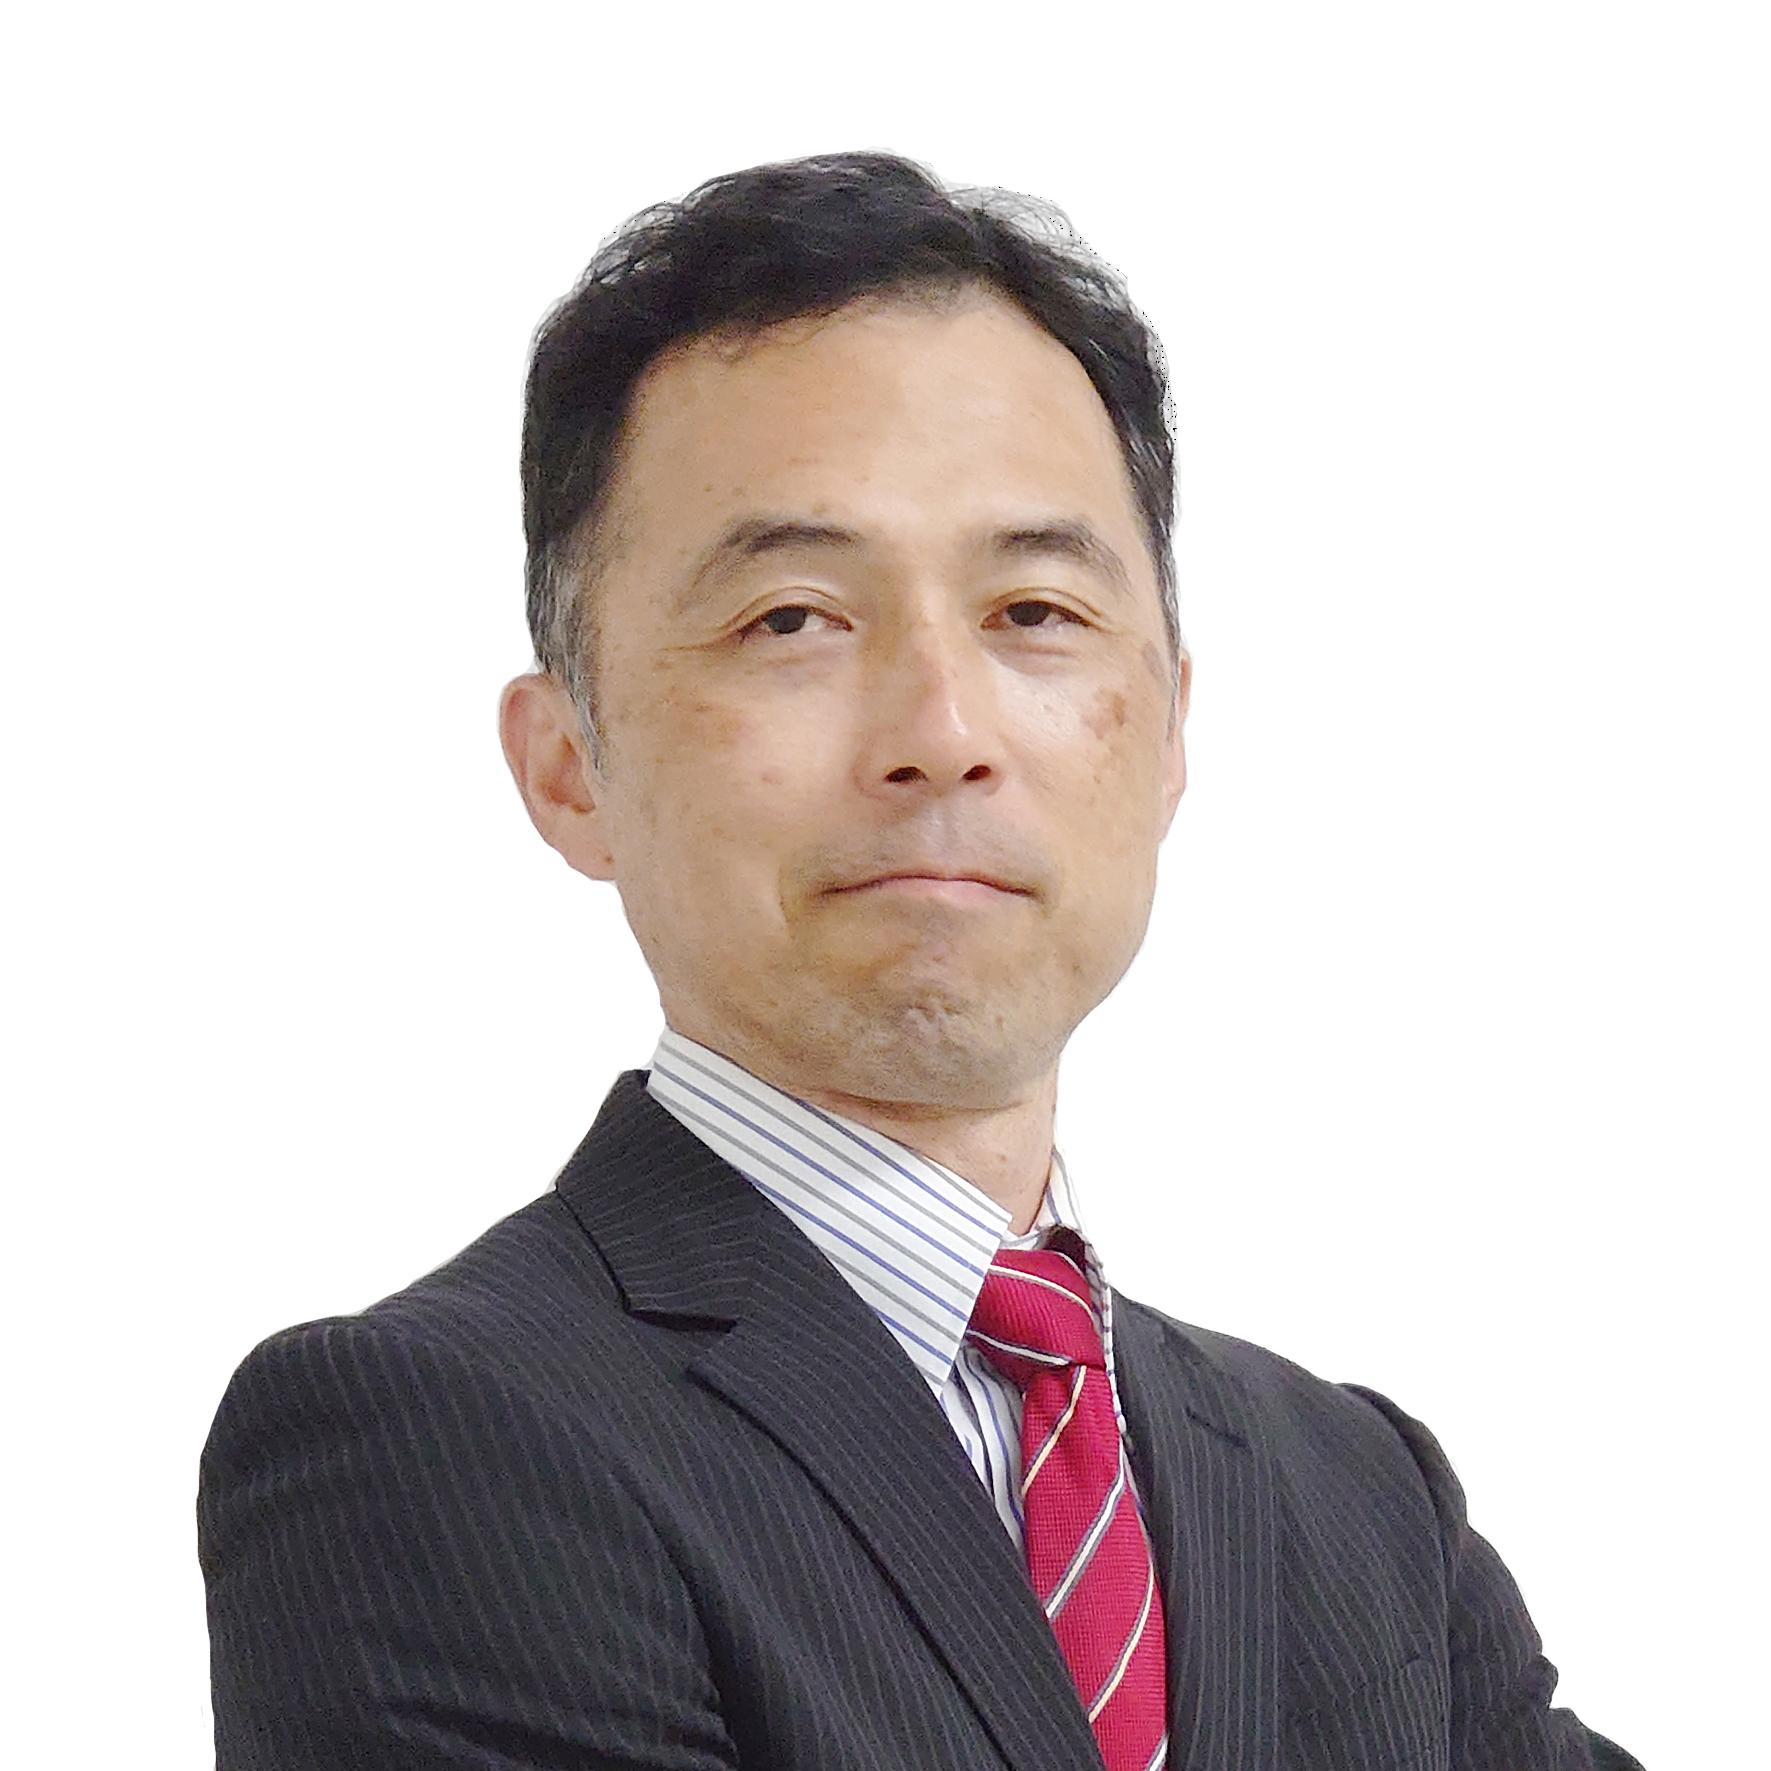 ASIMOV ROBOTICS株式会社 執行役員 CMO 中村忠司